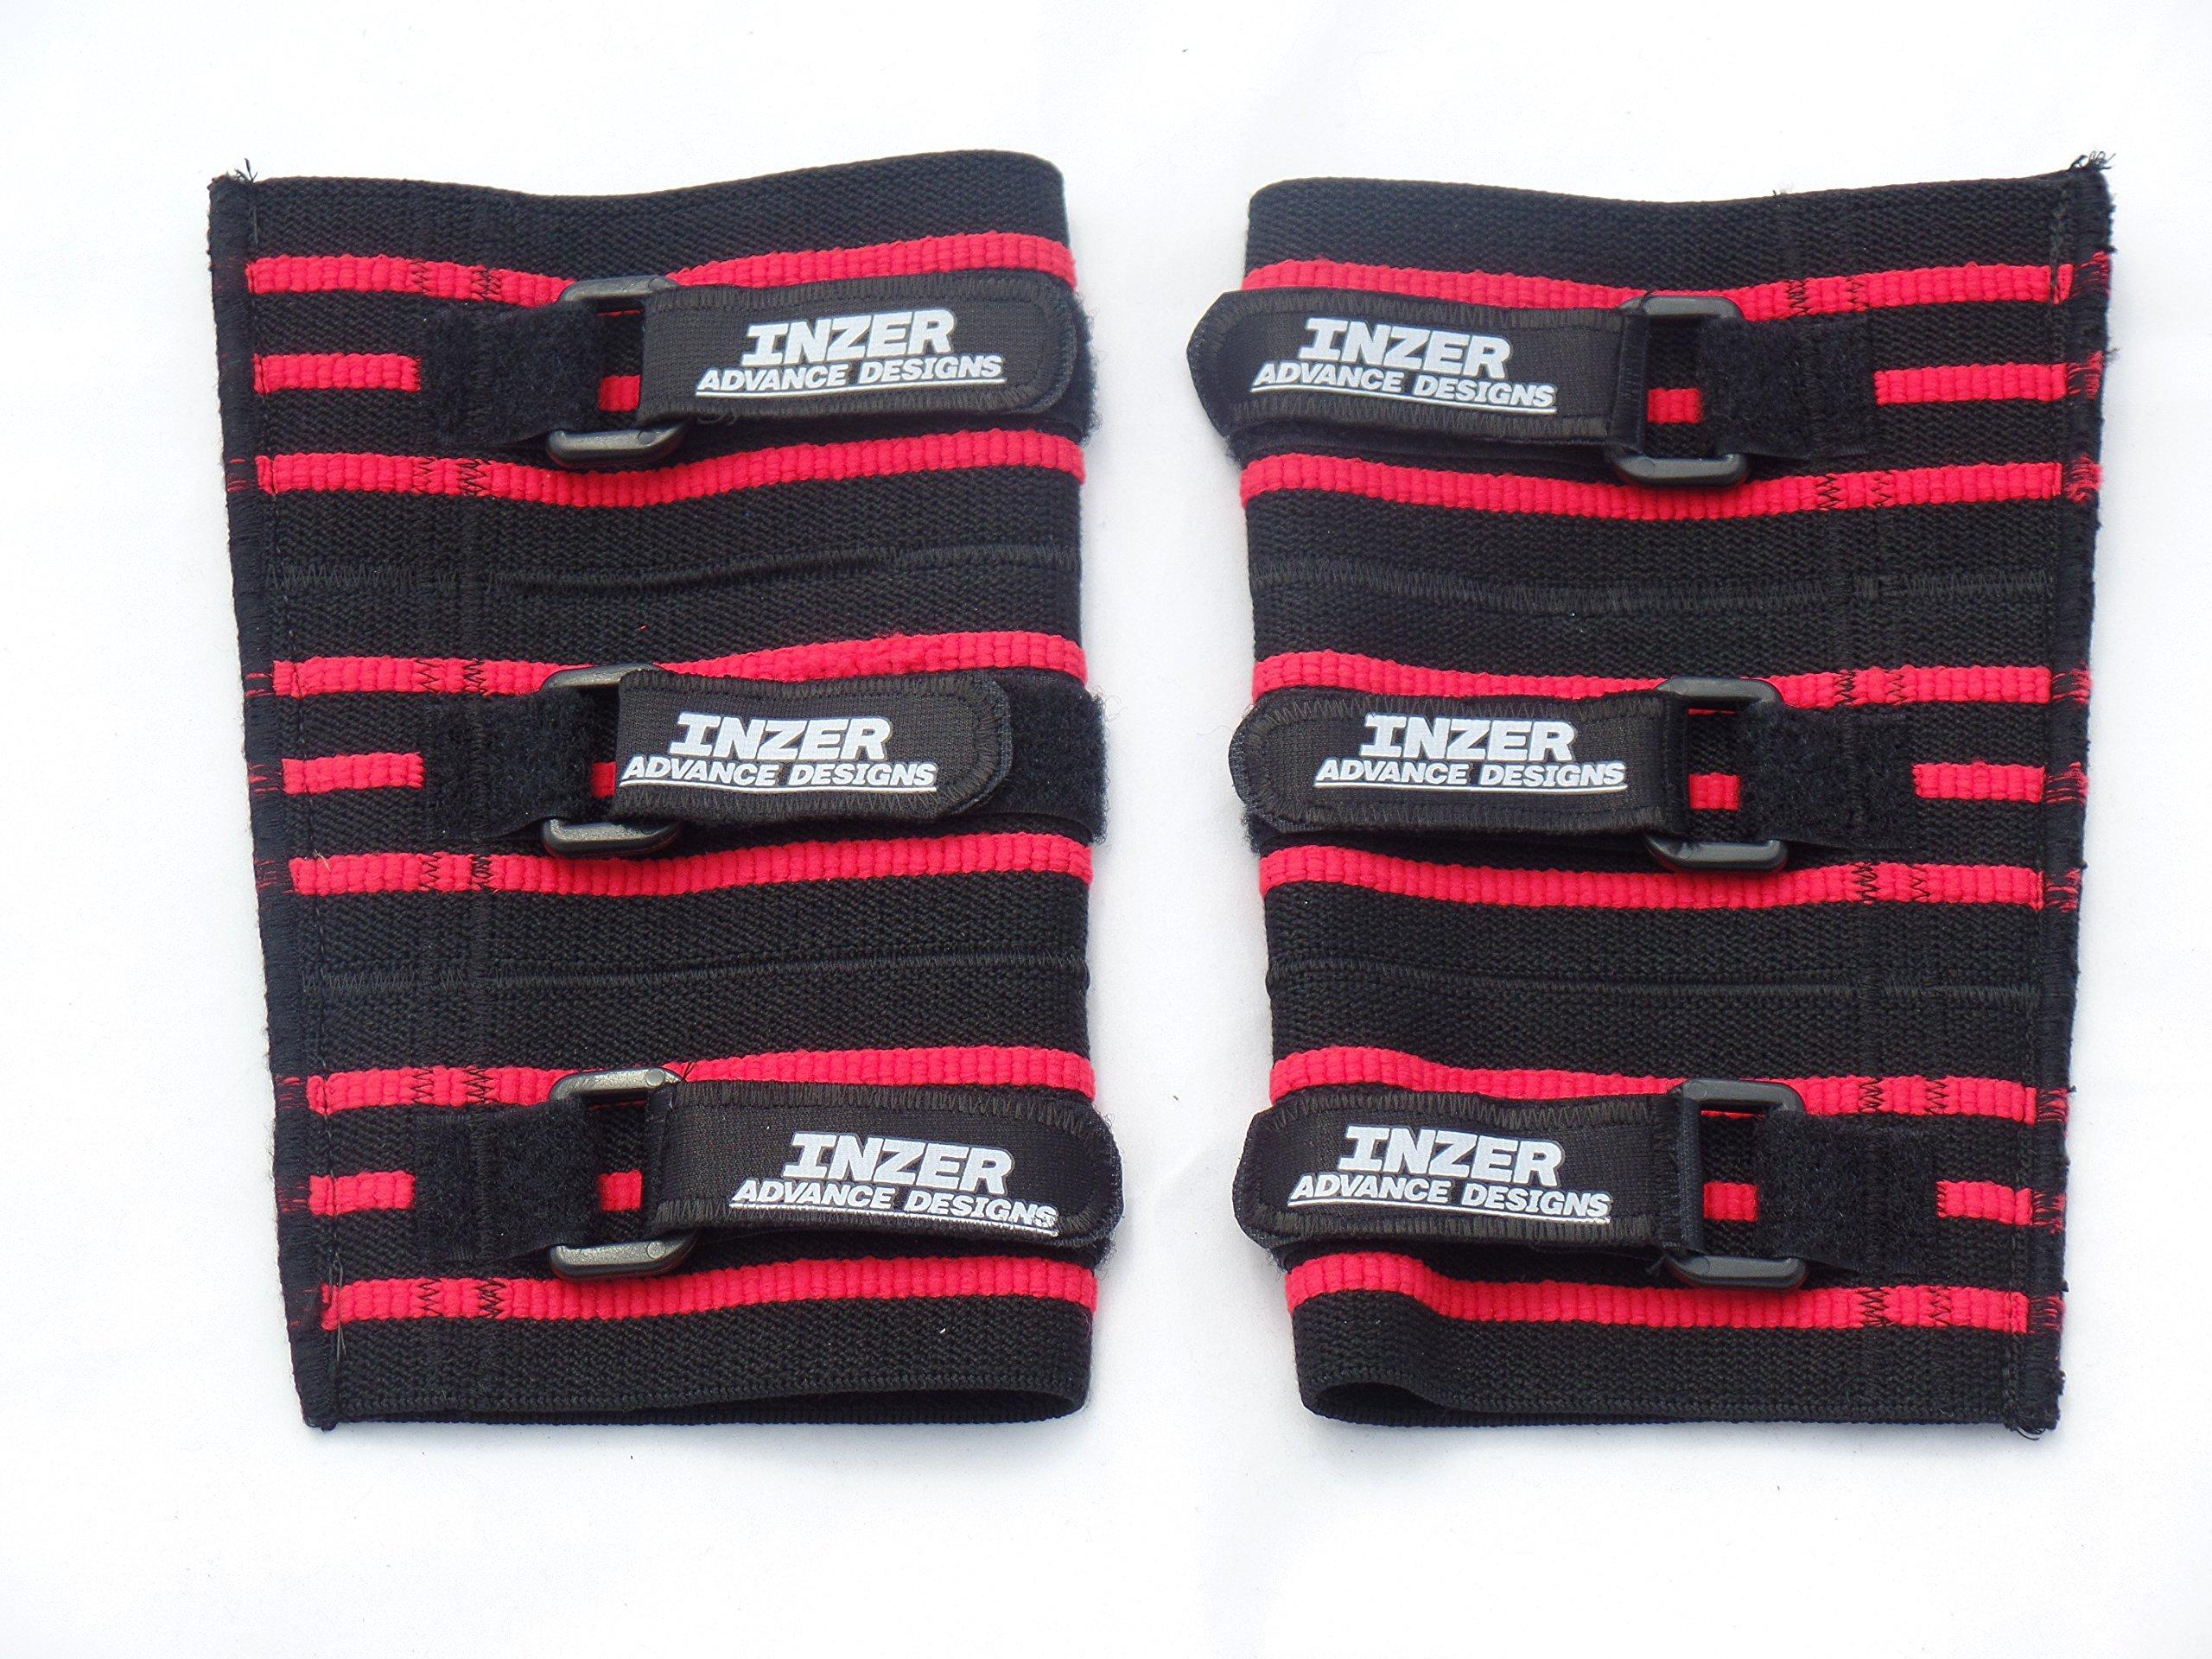 Inzer Advance Designs XT Elbow Sleeves 2XLarge Black